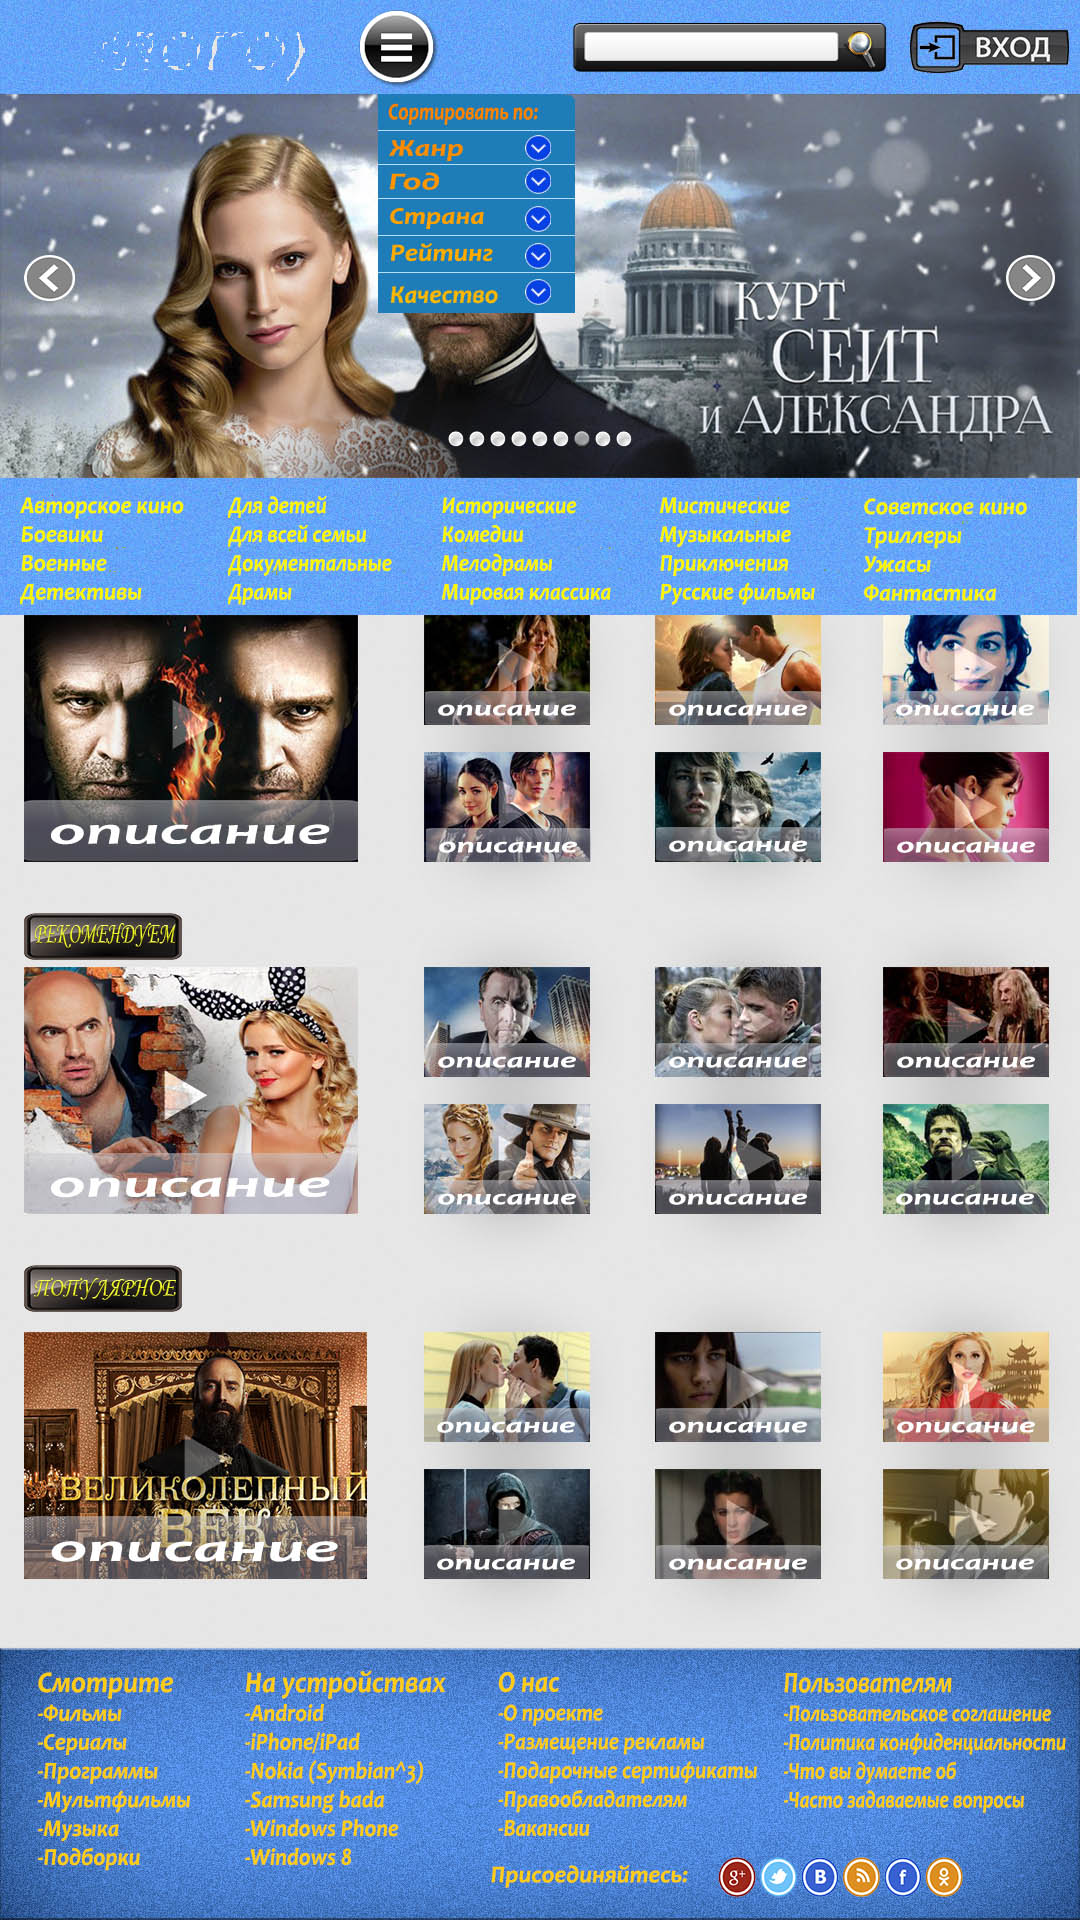 Дизайн для онлайн-кинотеатра фото f_3475523c44bdaabf.jpg